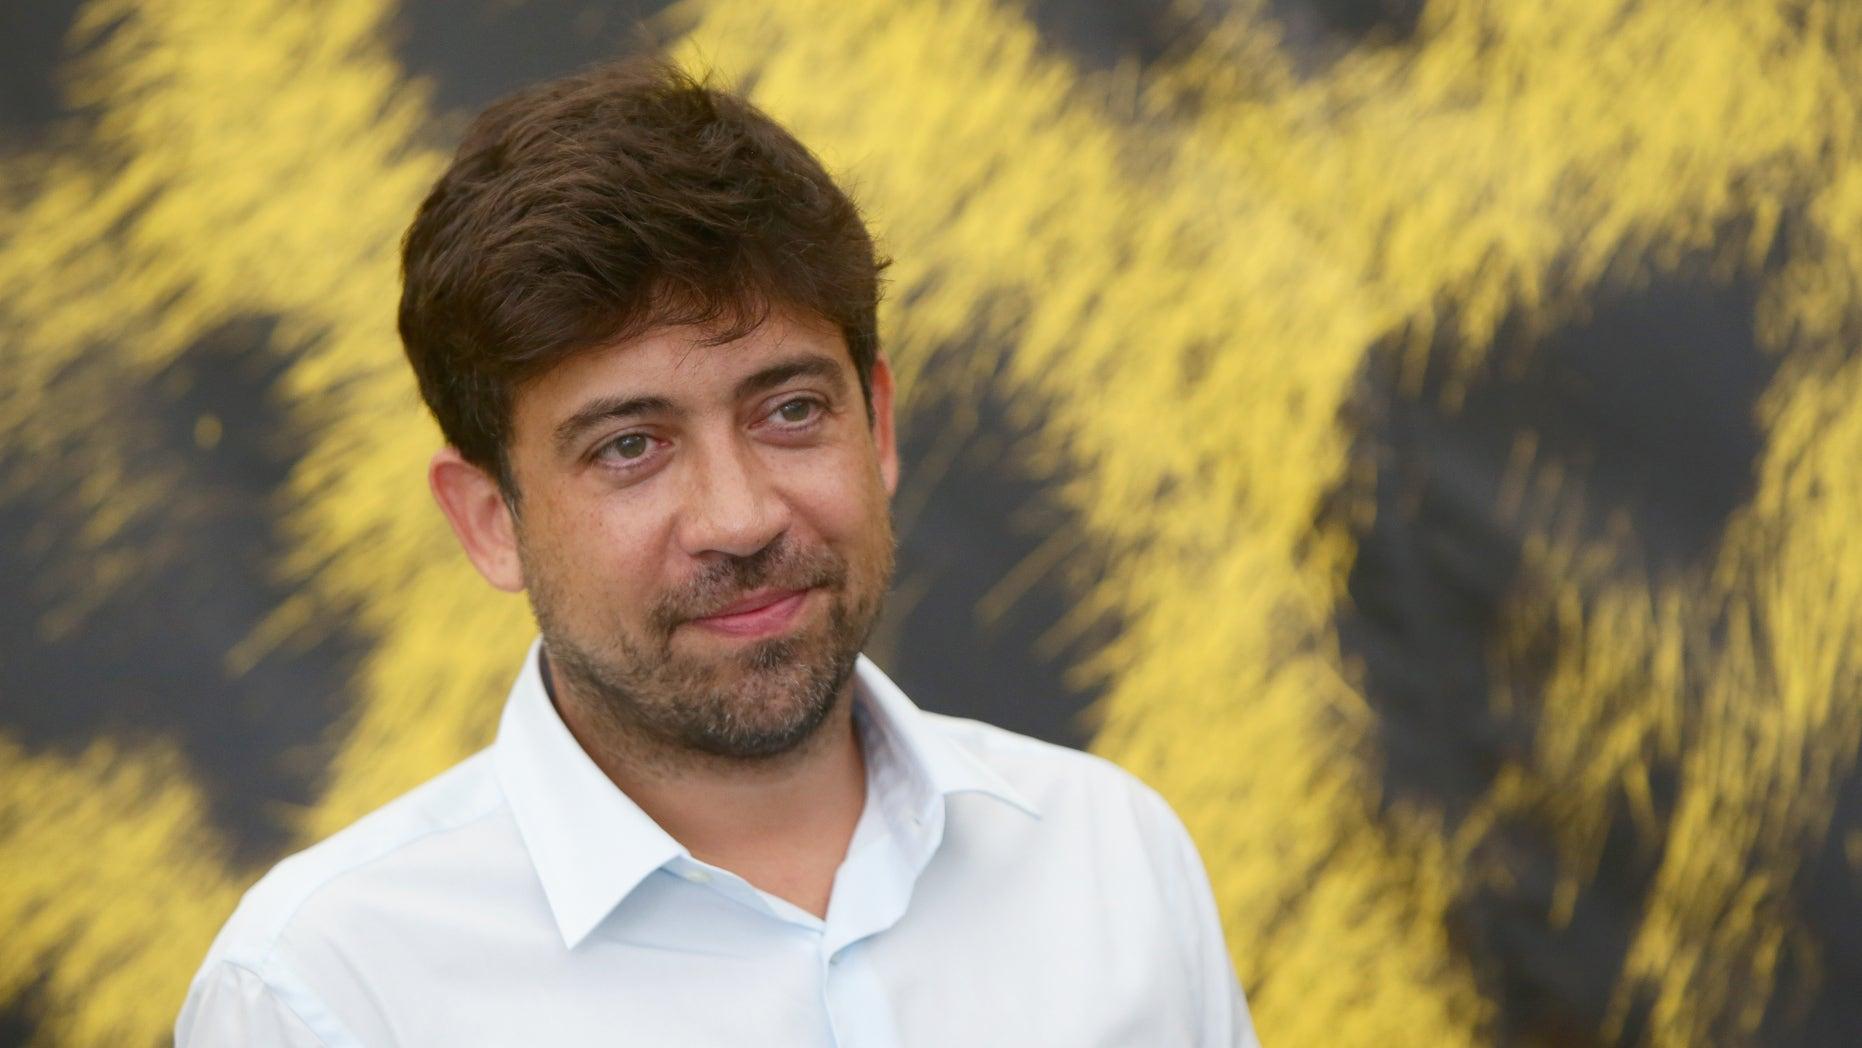 Director Alfonso Gomez-Rejon on August 14, 2015 in Locarno, Switzerland.